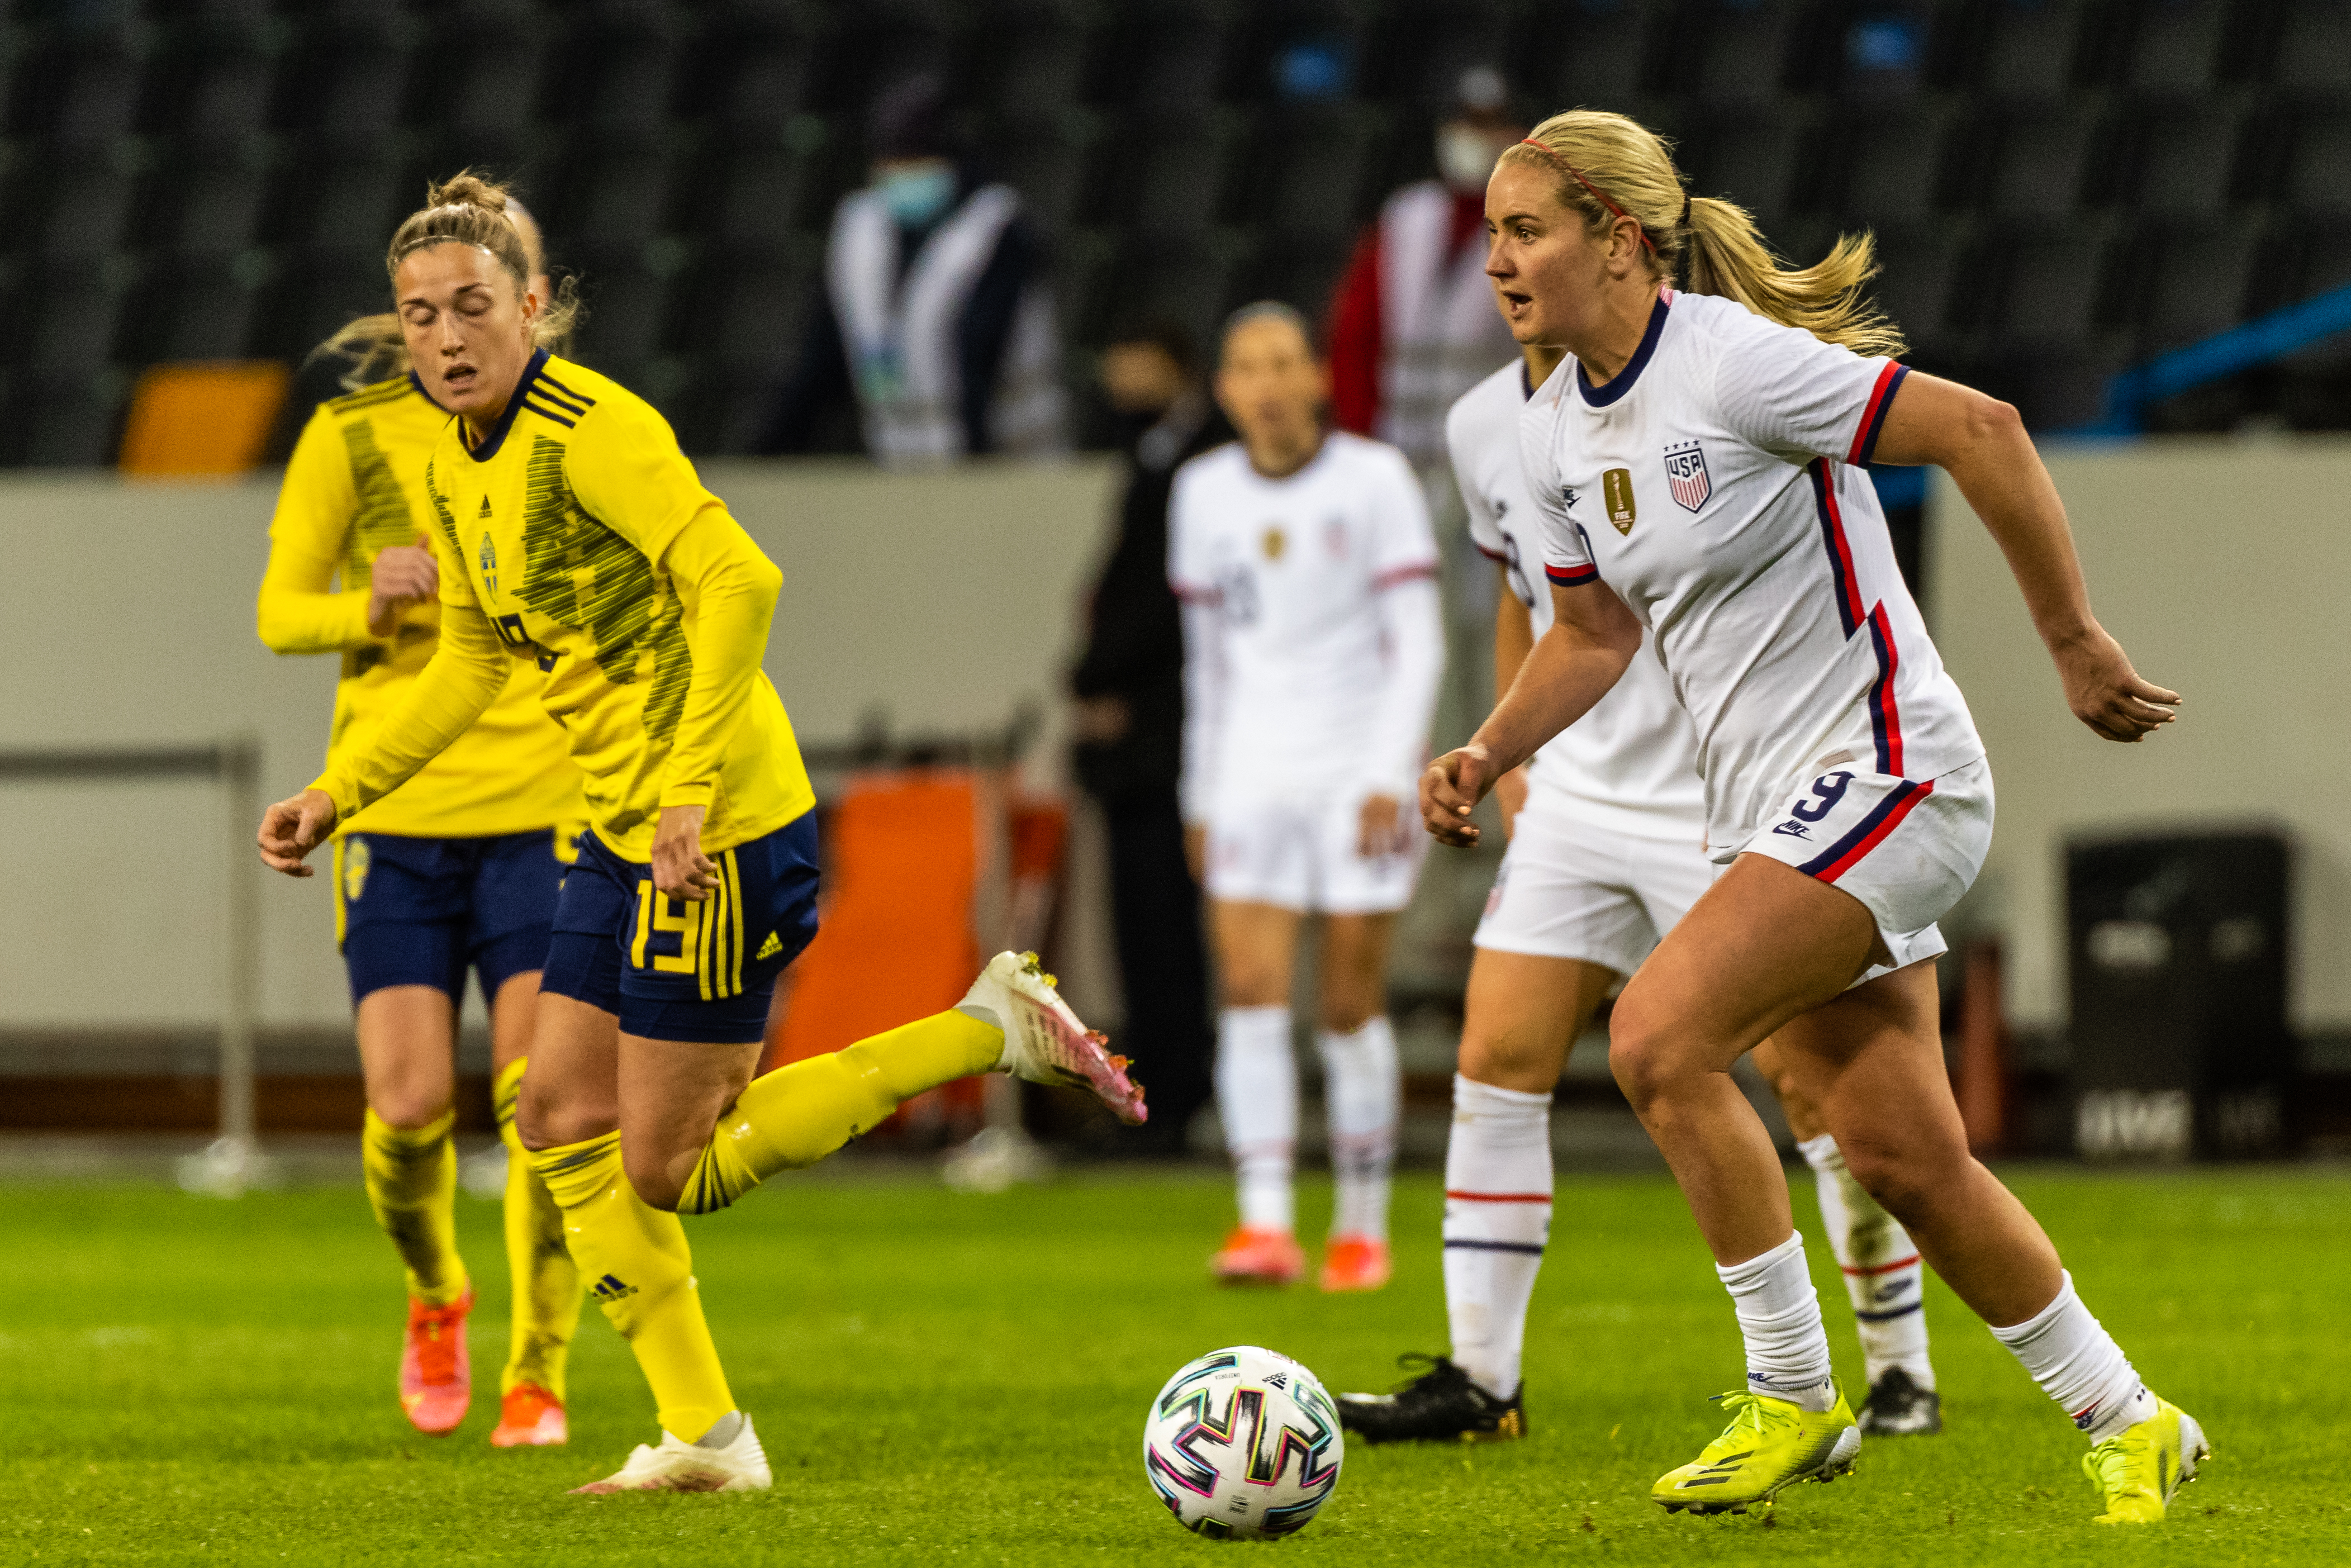 Sweden - USA - Women's International Friendly